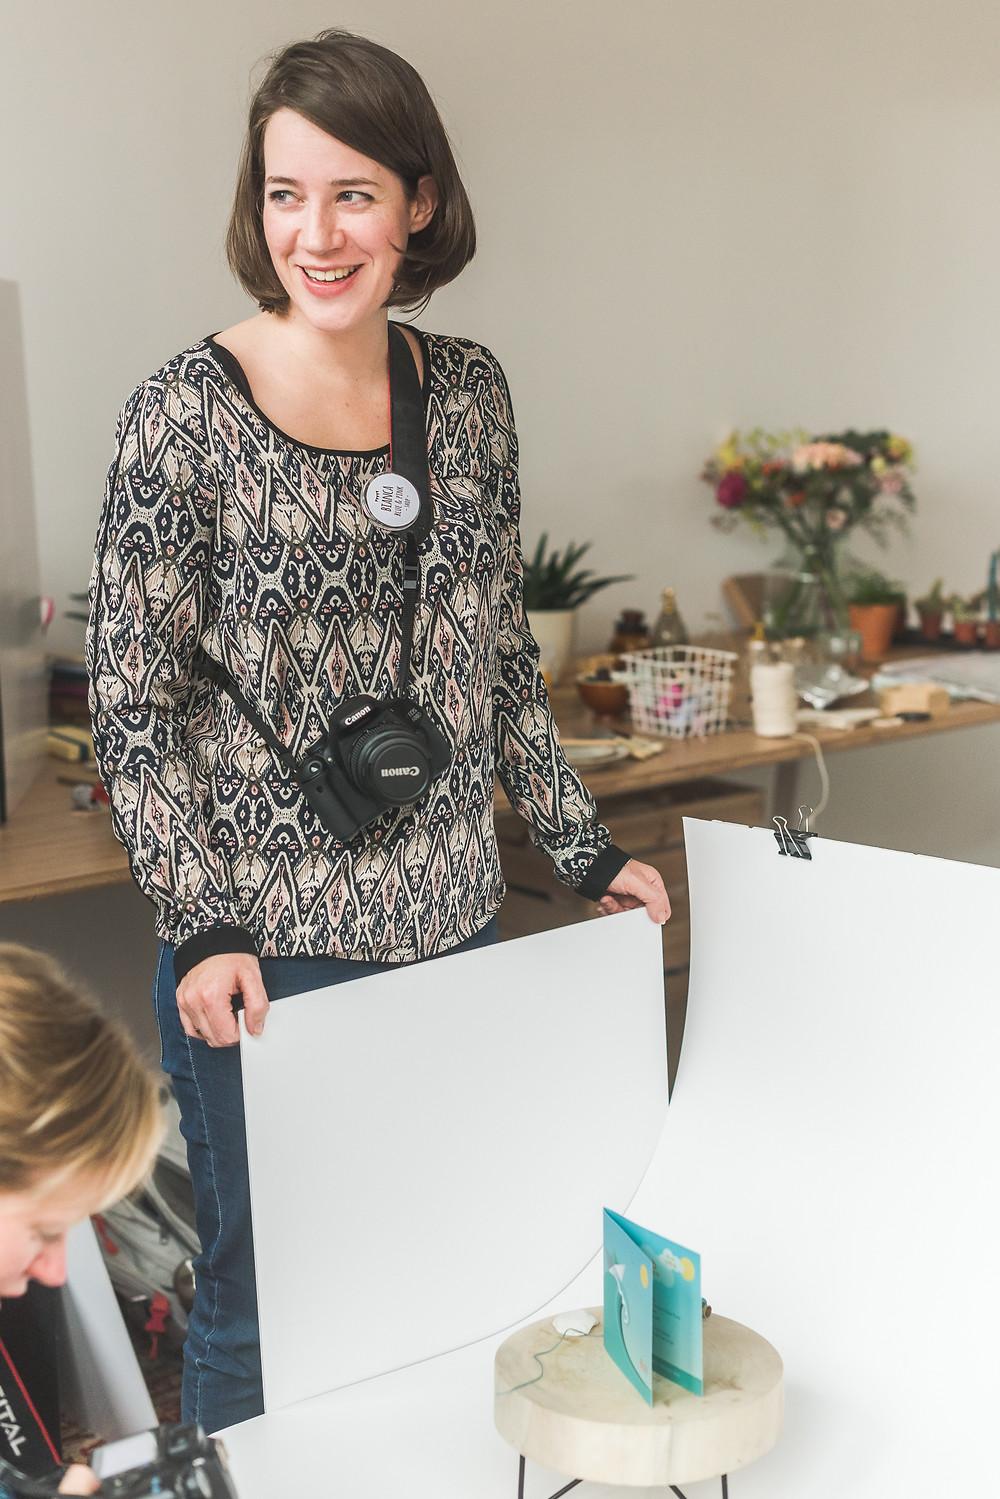 Workshop Fotografie & Styling (c) Silvie Bonne